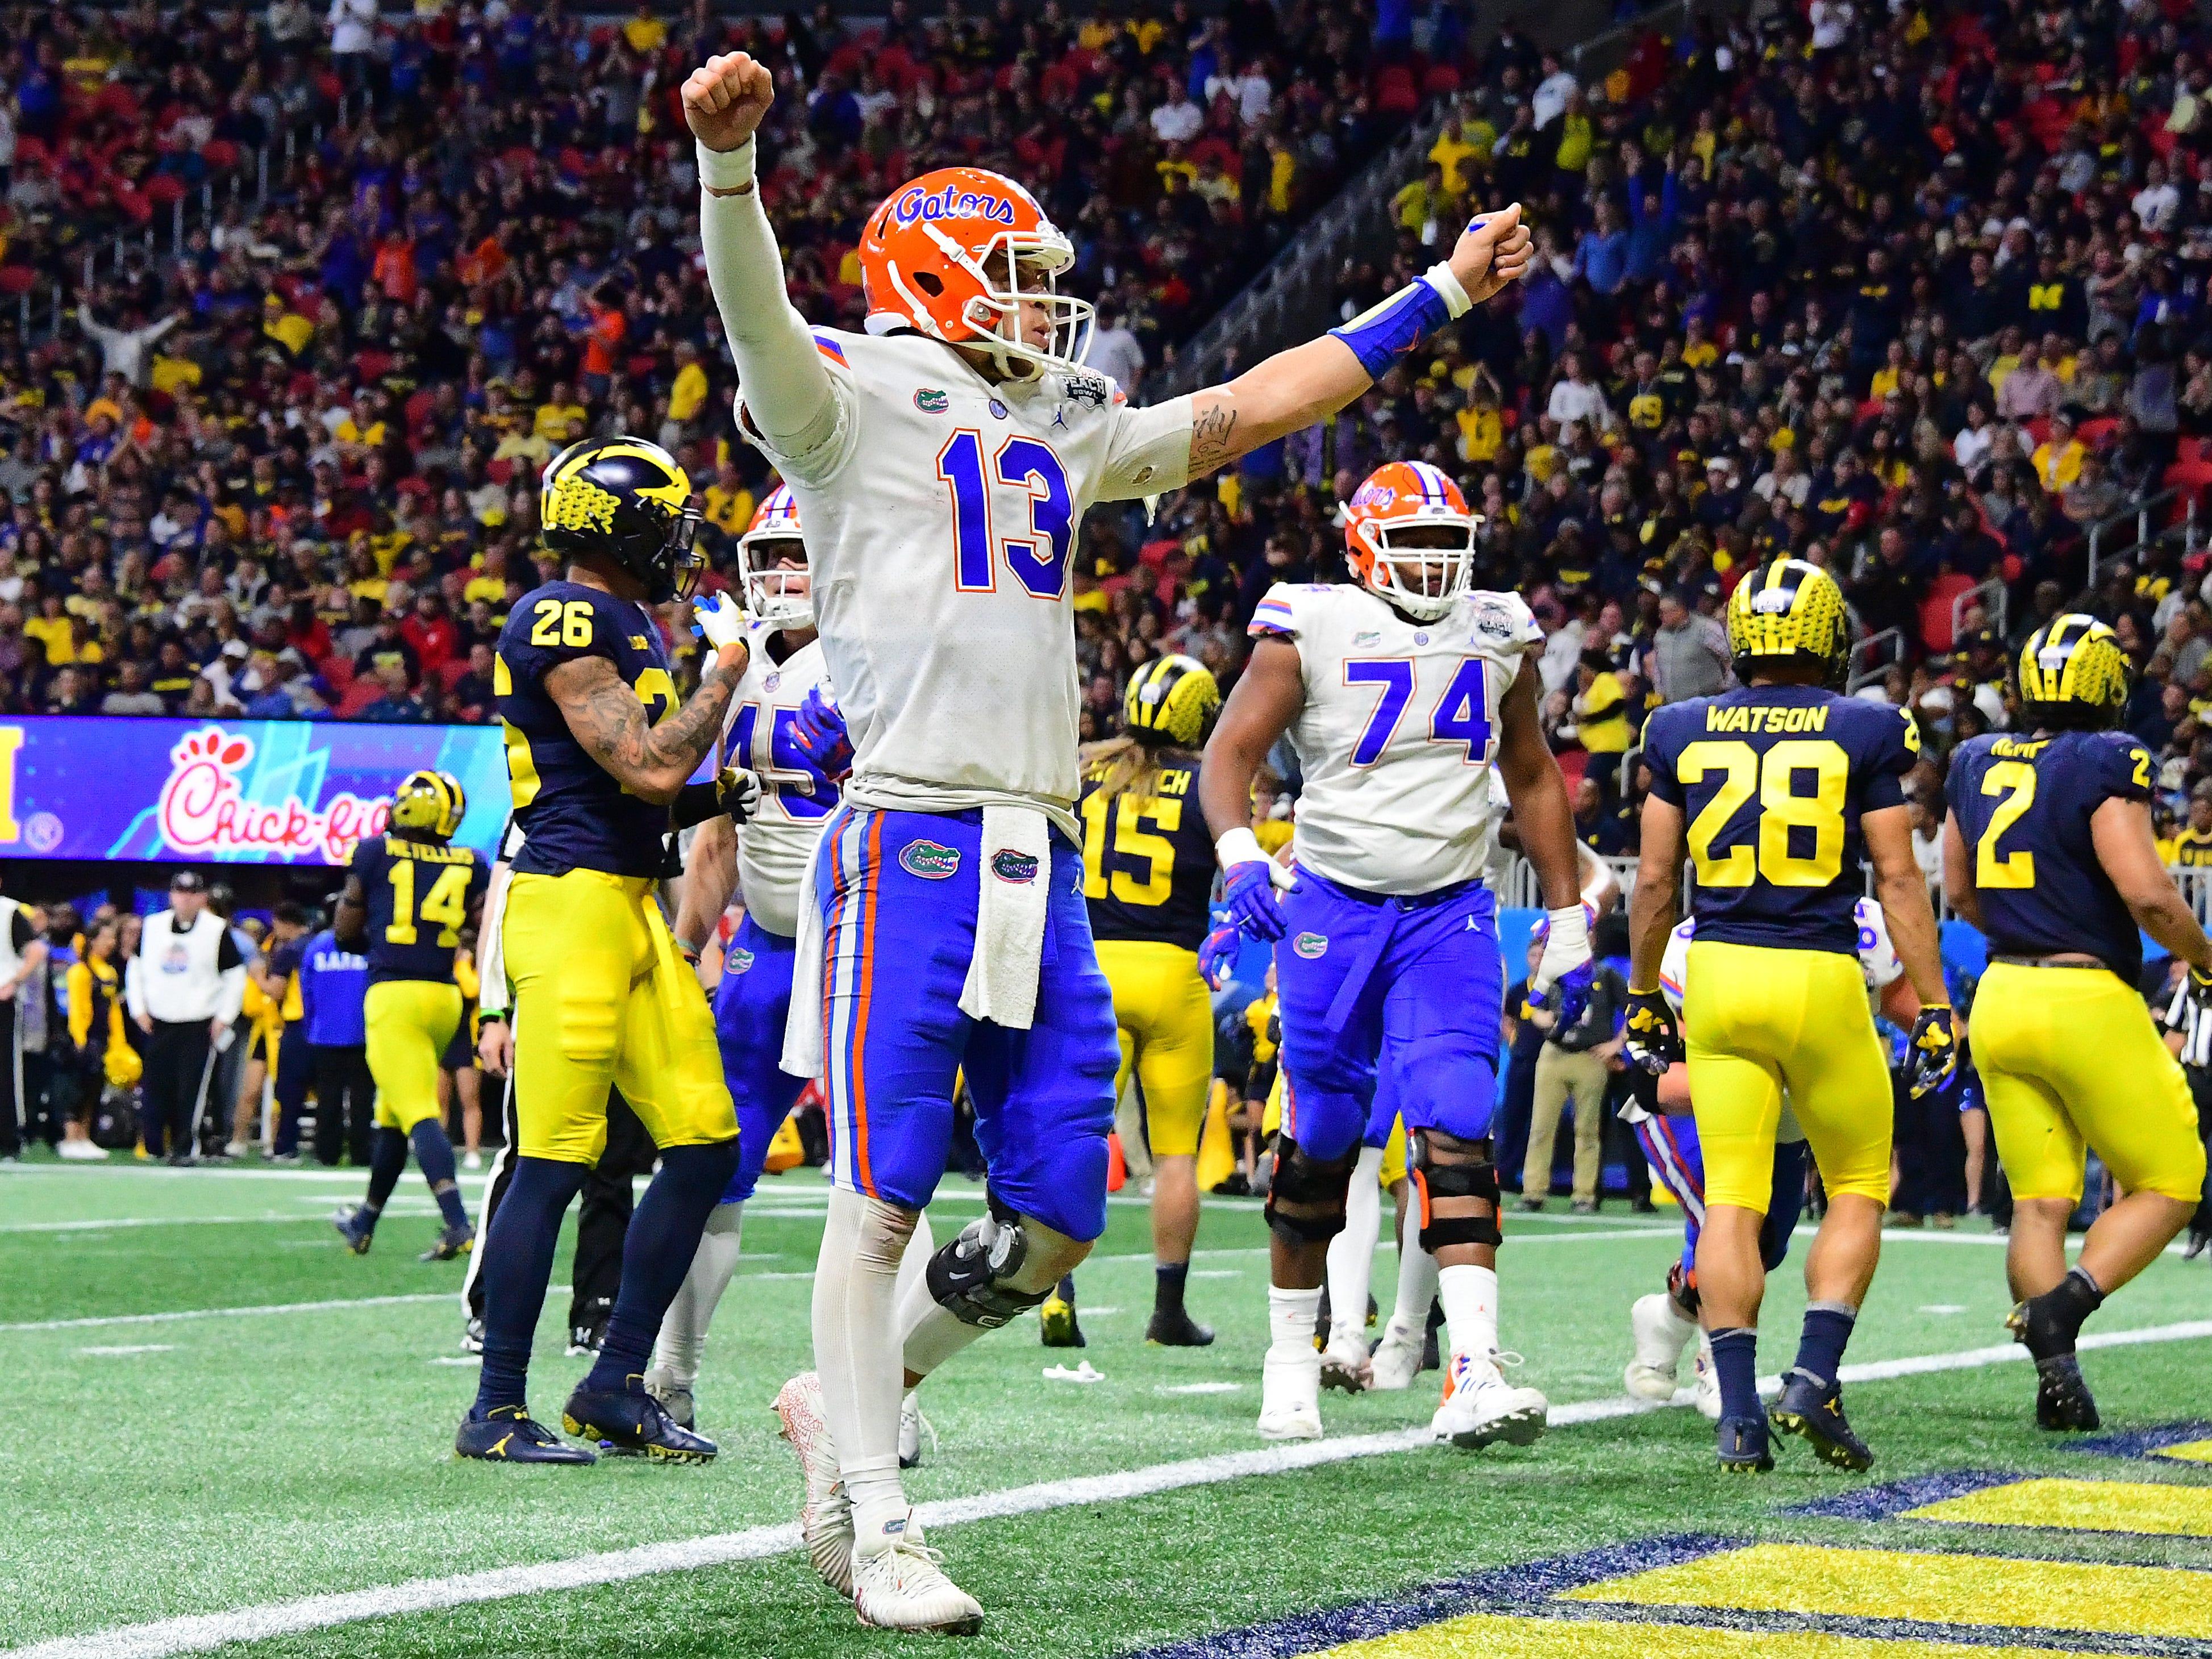 Florida QB Feleipe Franks celebrates a touchdown by teammate Jordan Scarlett (not pictured) against Michigan during the first half on Saturday, Dec. 29, 2018, in Atlanta.